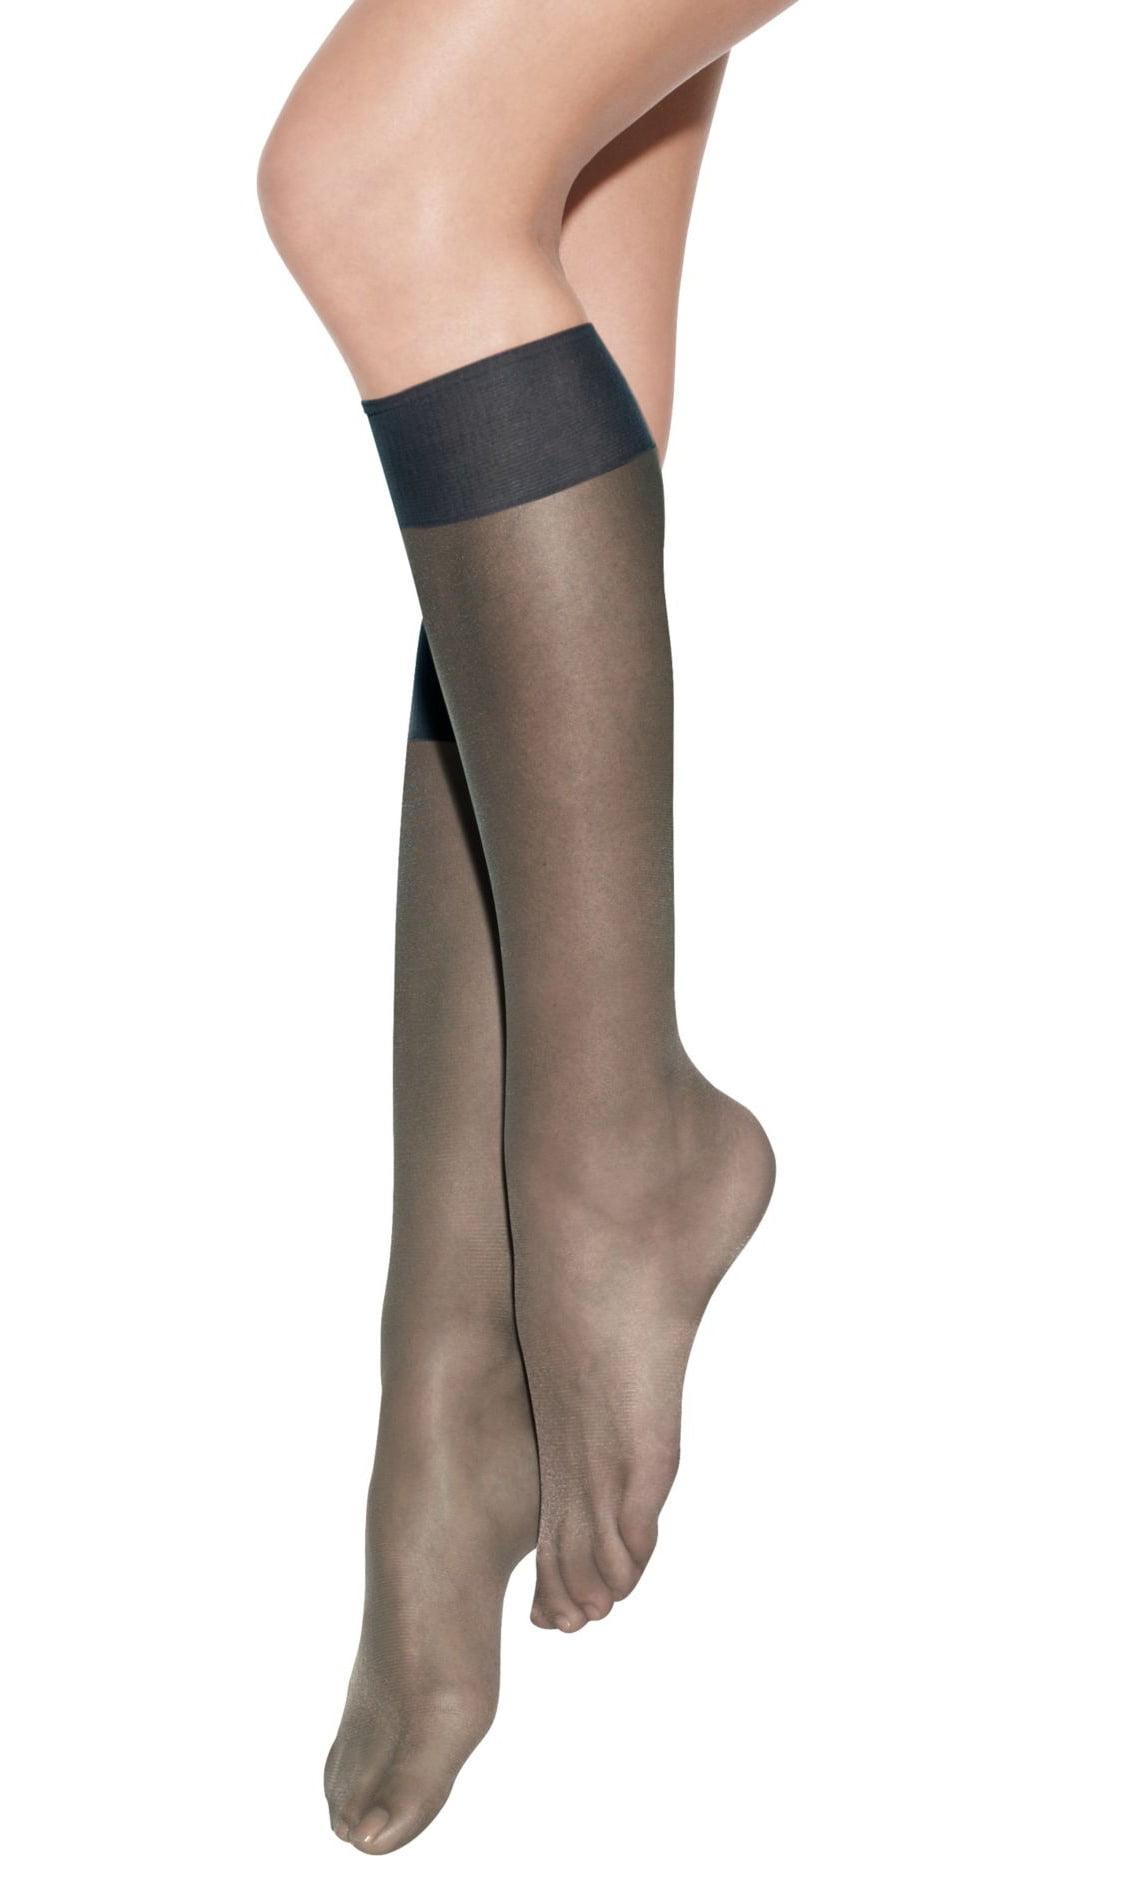 20809d155 Hanes - Silk Reflections Women`s Pure Bliss Luxe Sheer Knee Highs ...